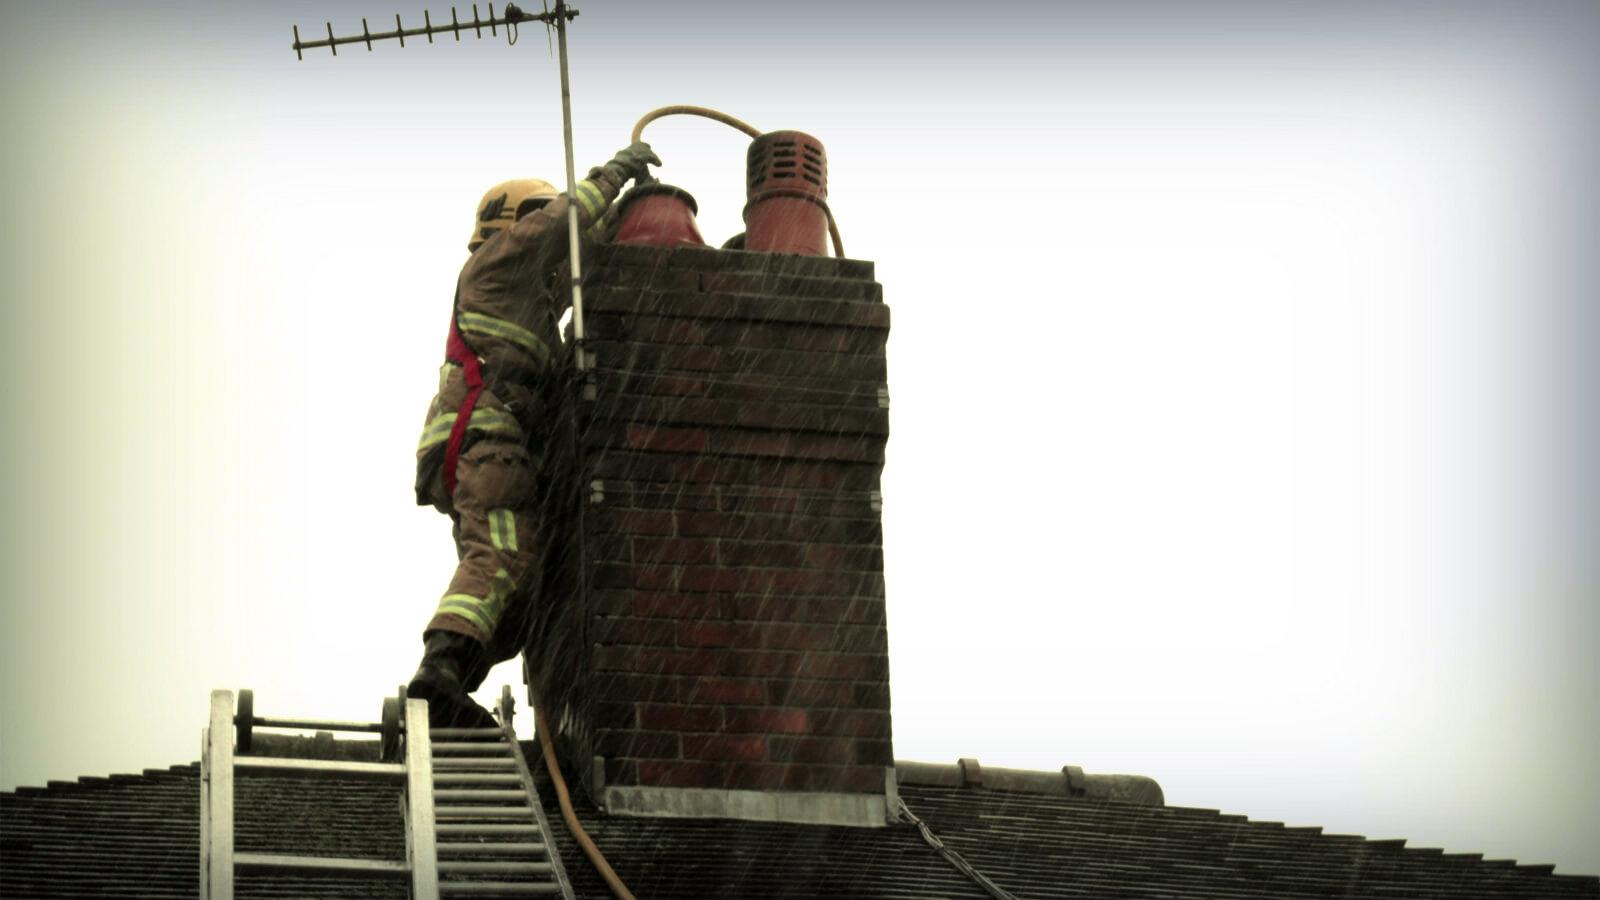 pozar-dimnjaka-gasenje-i-opasnosti-vatrogasci-sveta-klara